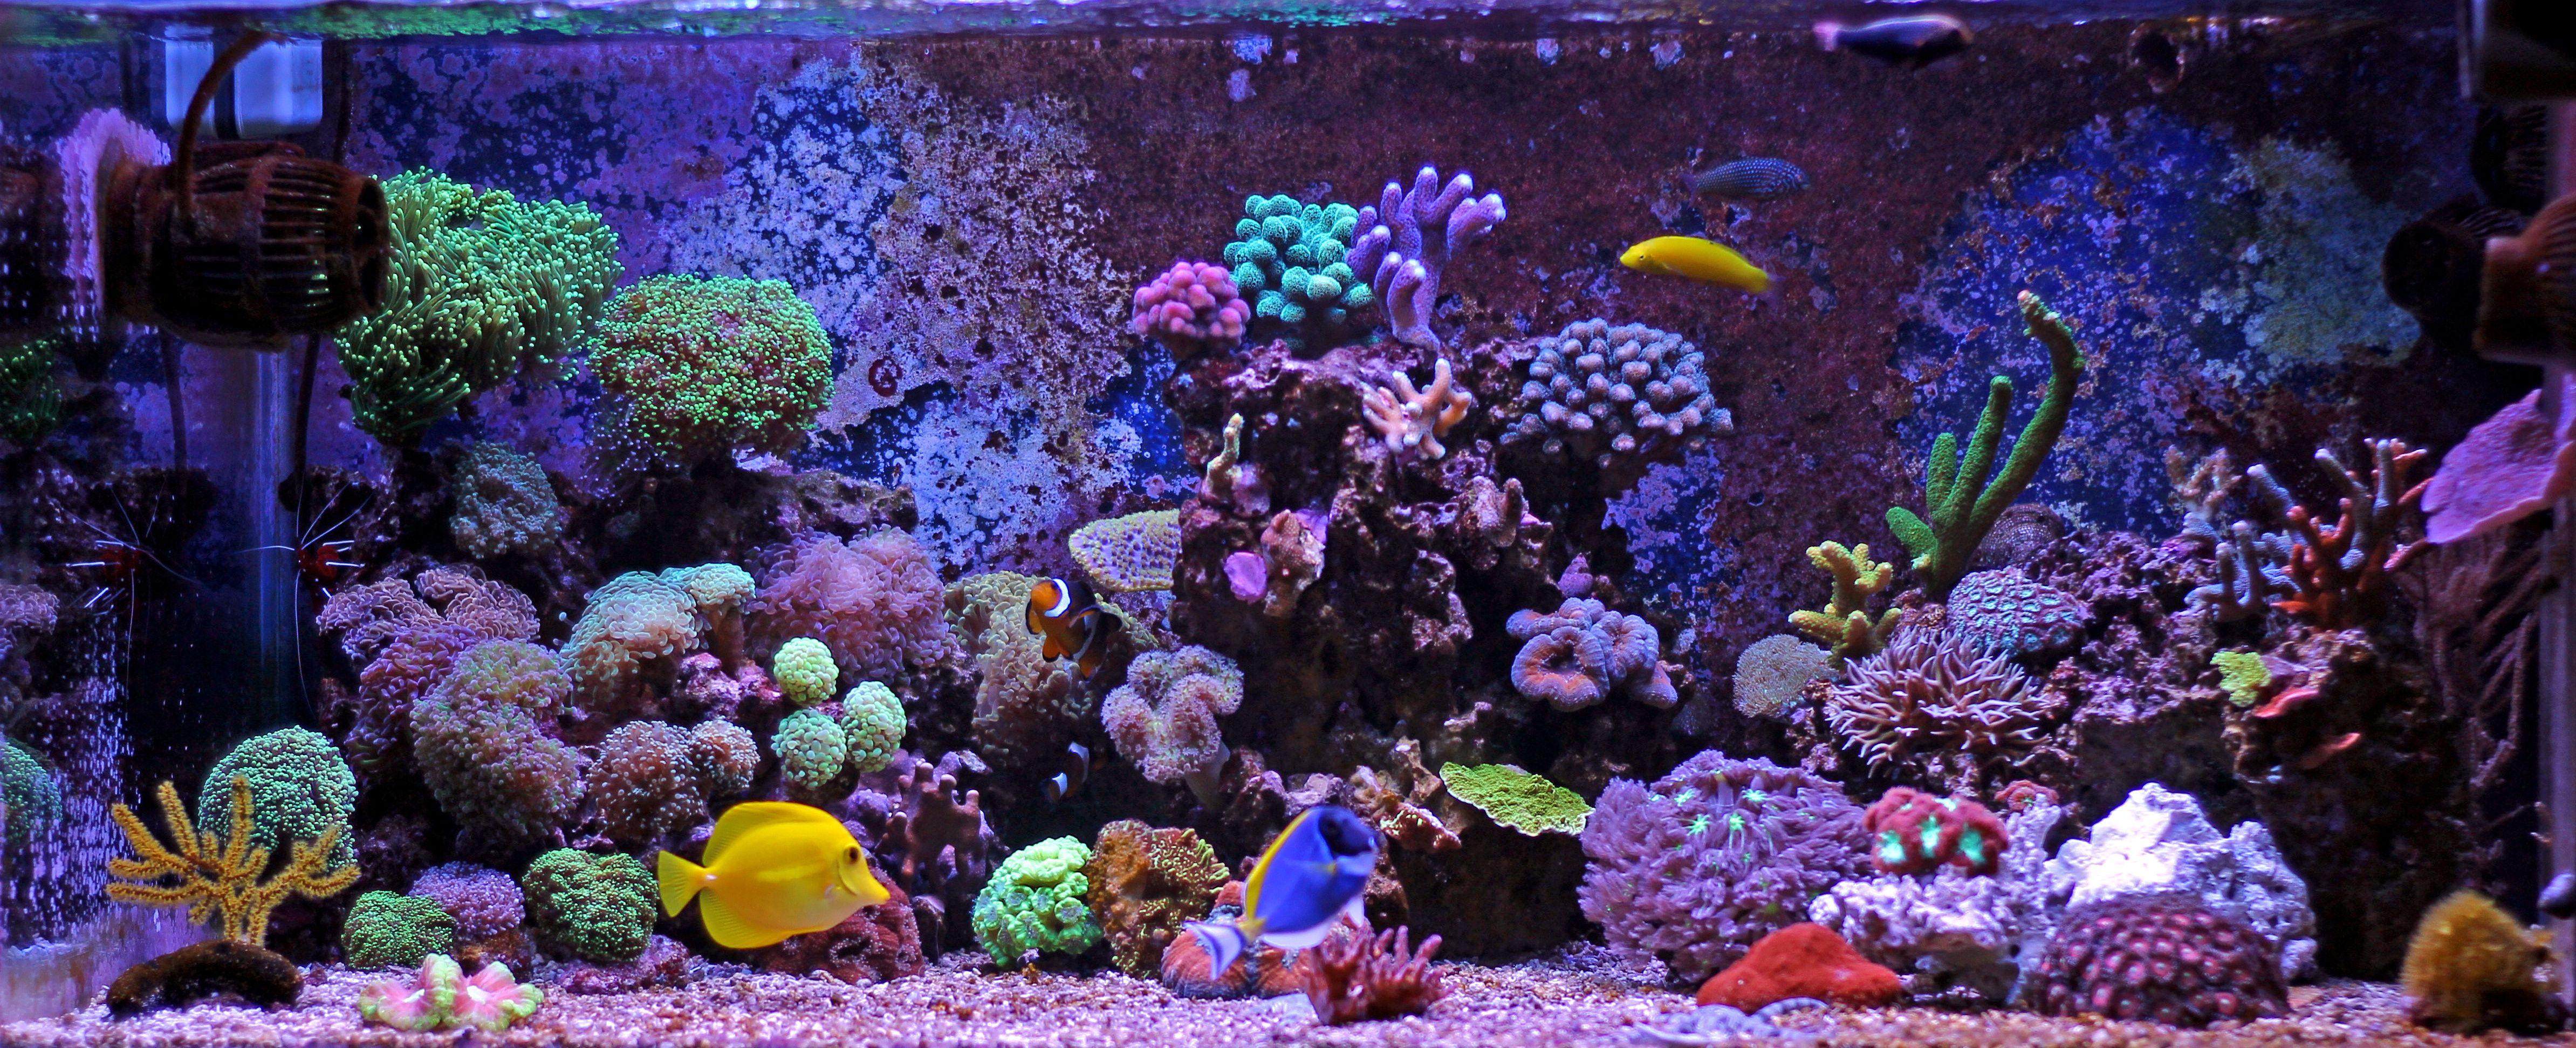 7 Best Led Aquarium Light Buyers Guide Coral Reef Aquarium Reef Aquarium Aquarium